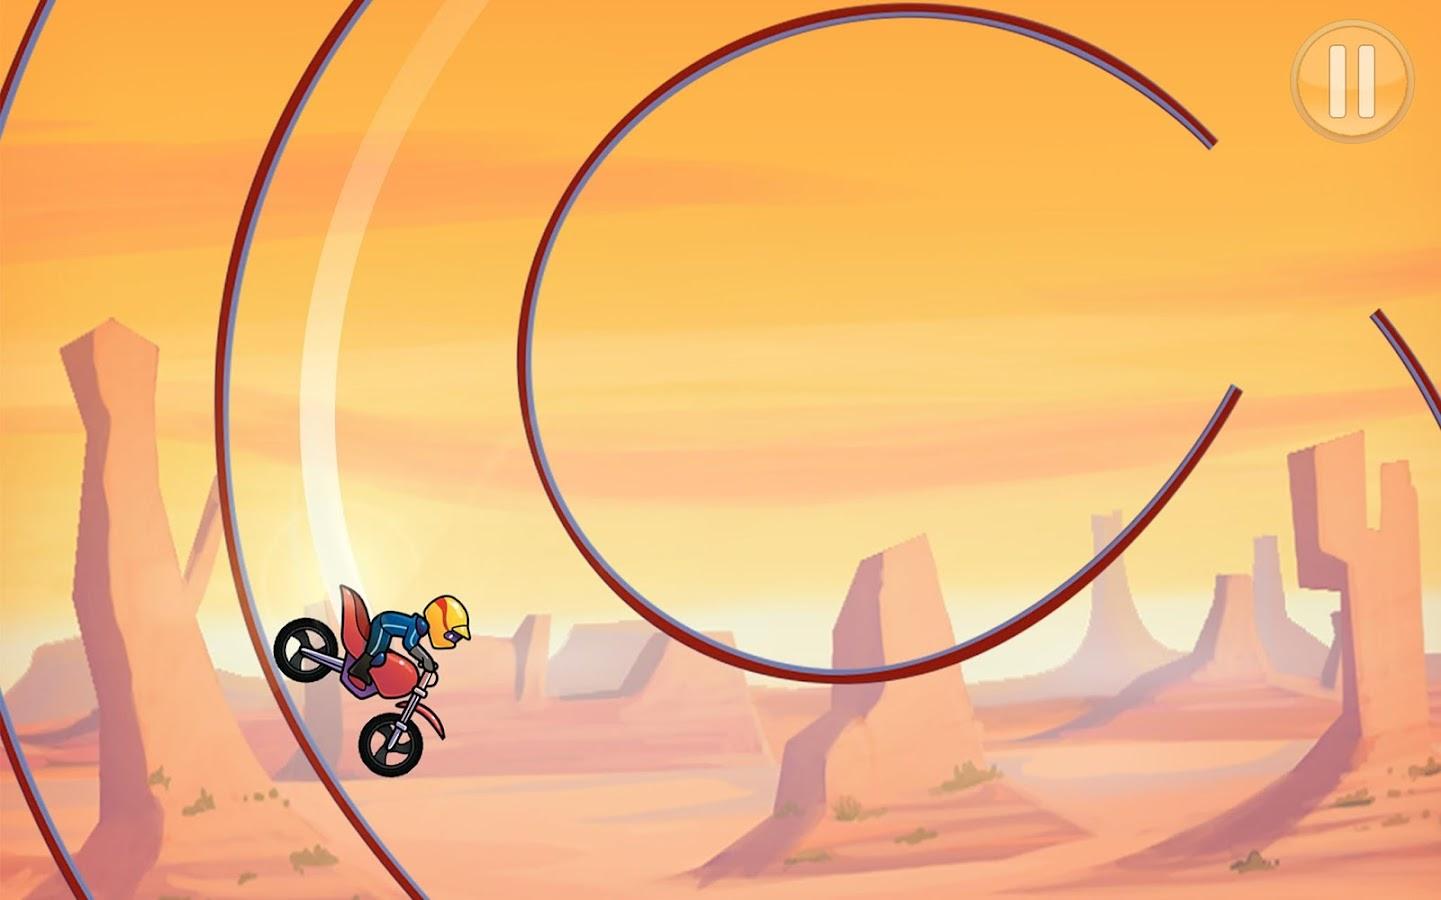 Bike Race Free - Top Motorcycle Racing Games 7.7.11 APK Download ...